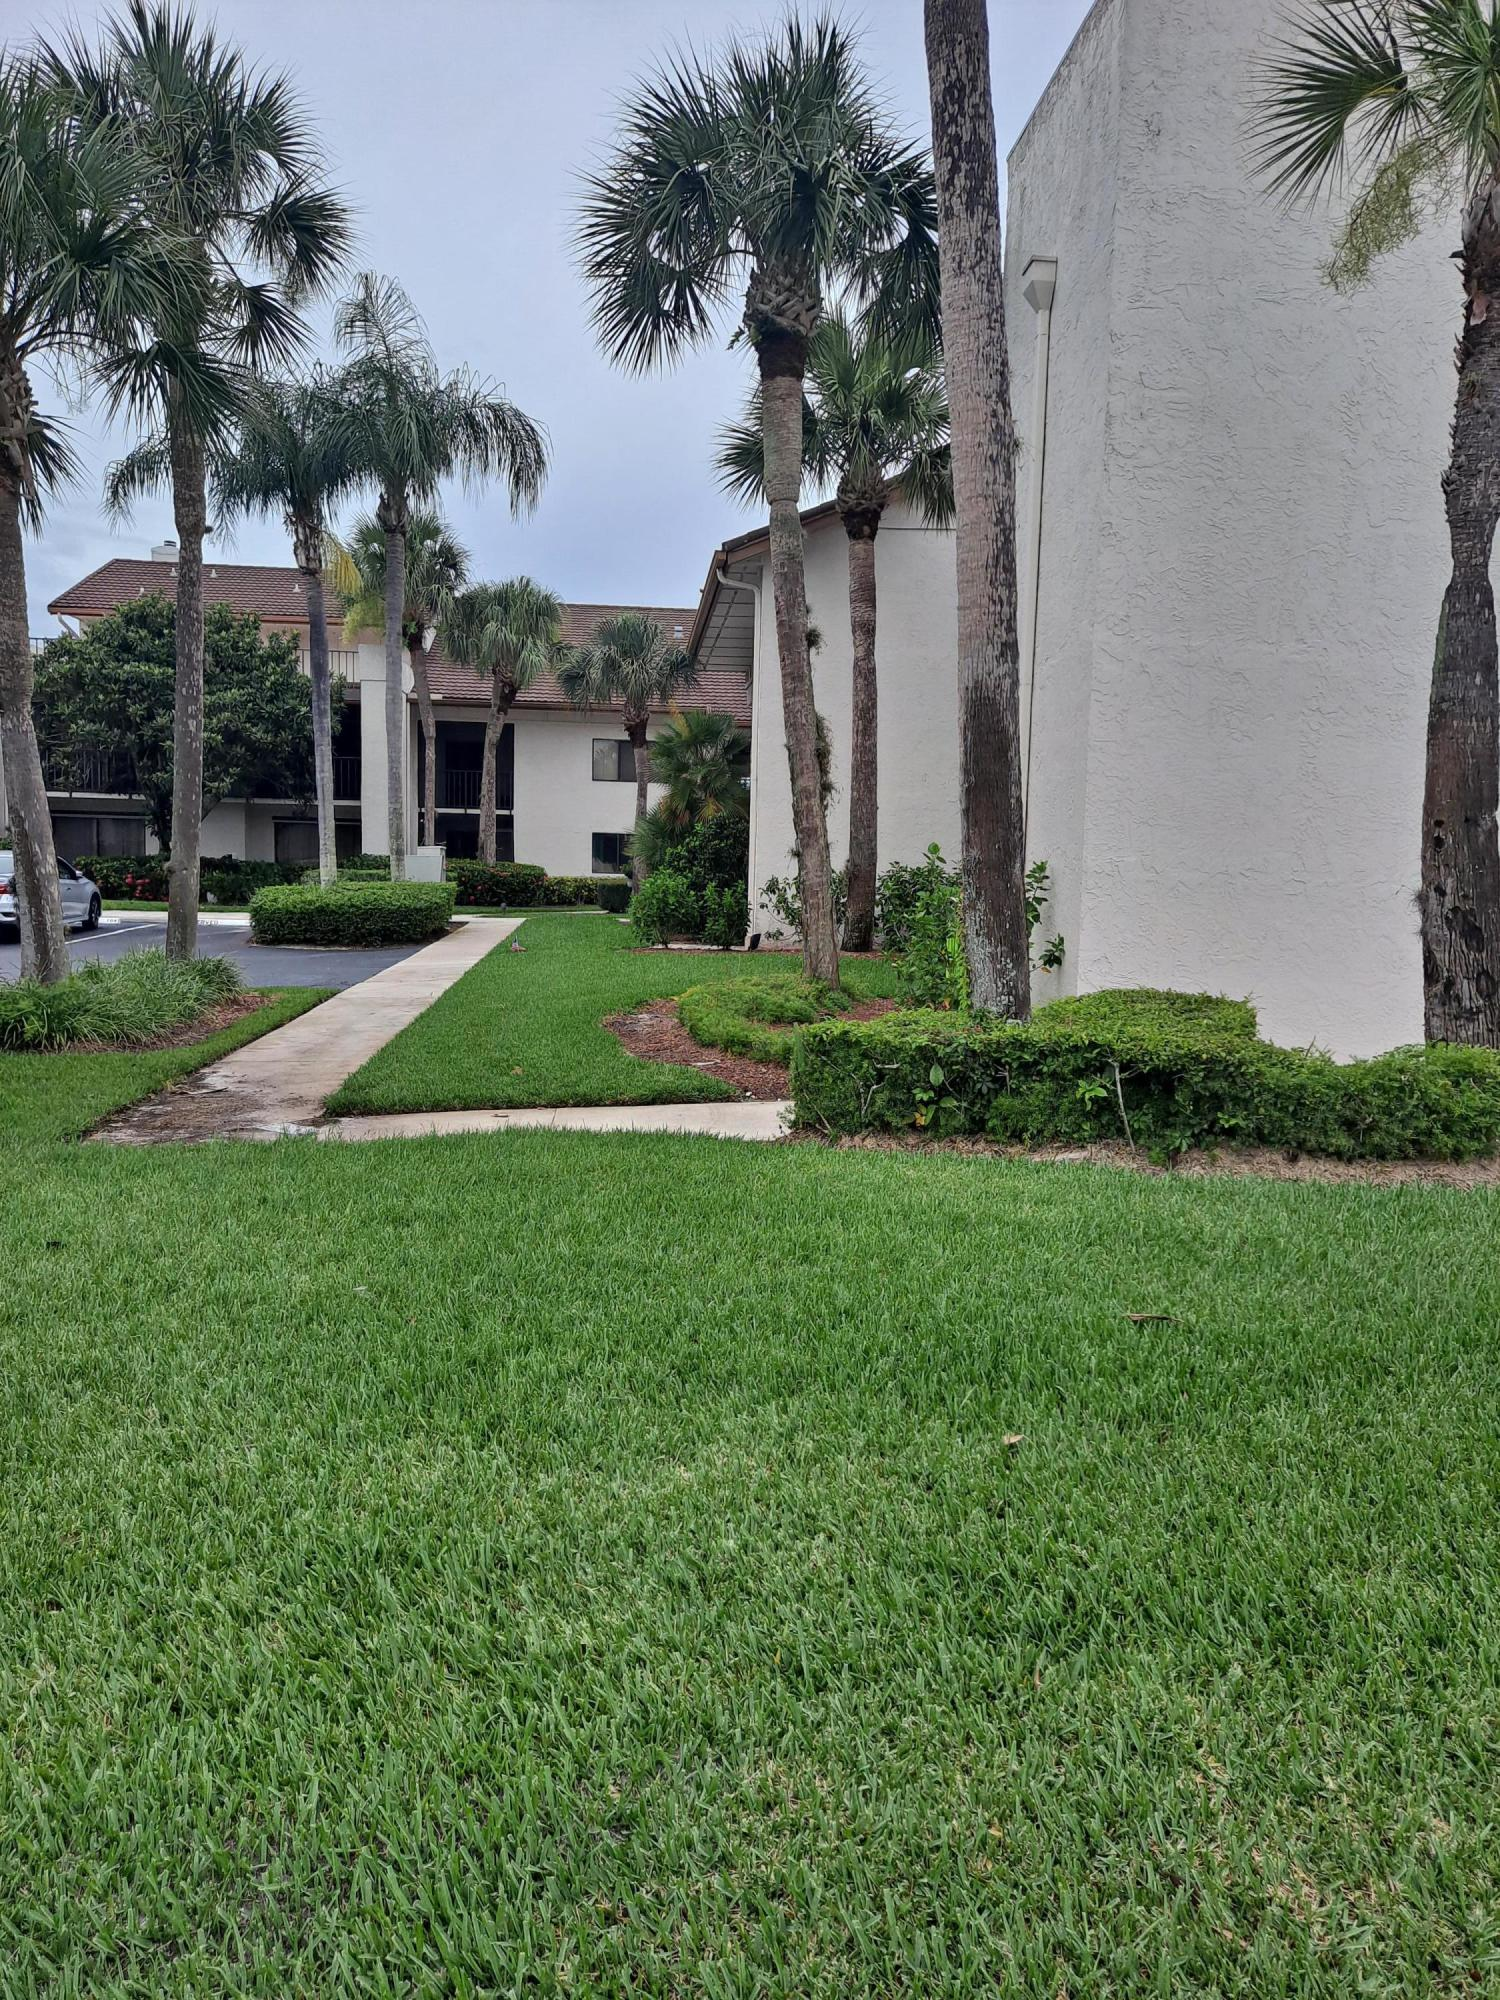 Details for 3500 Twin Lakes Terrace 202, Fort Pierce, FL 34950